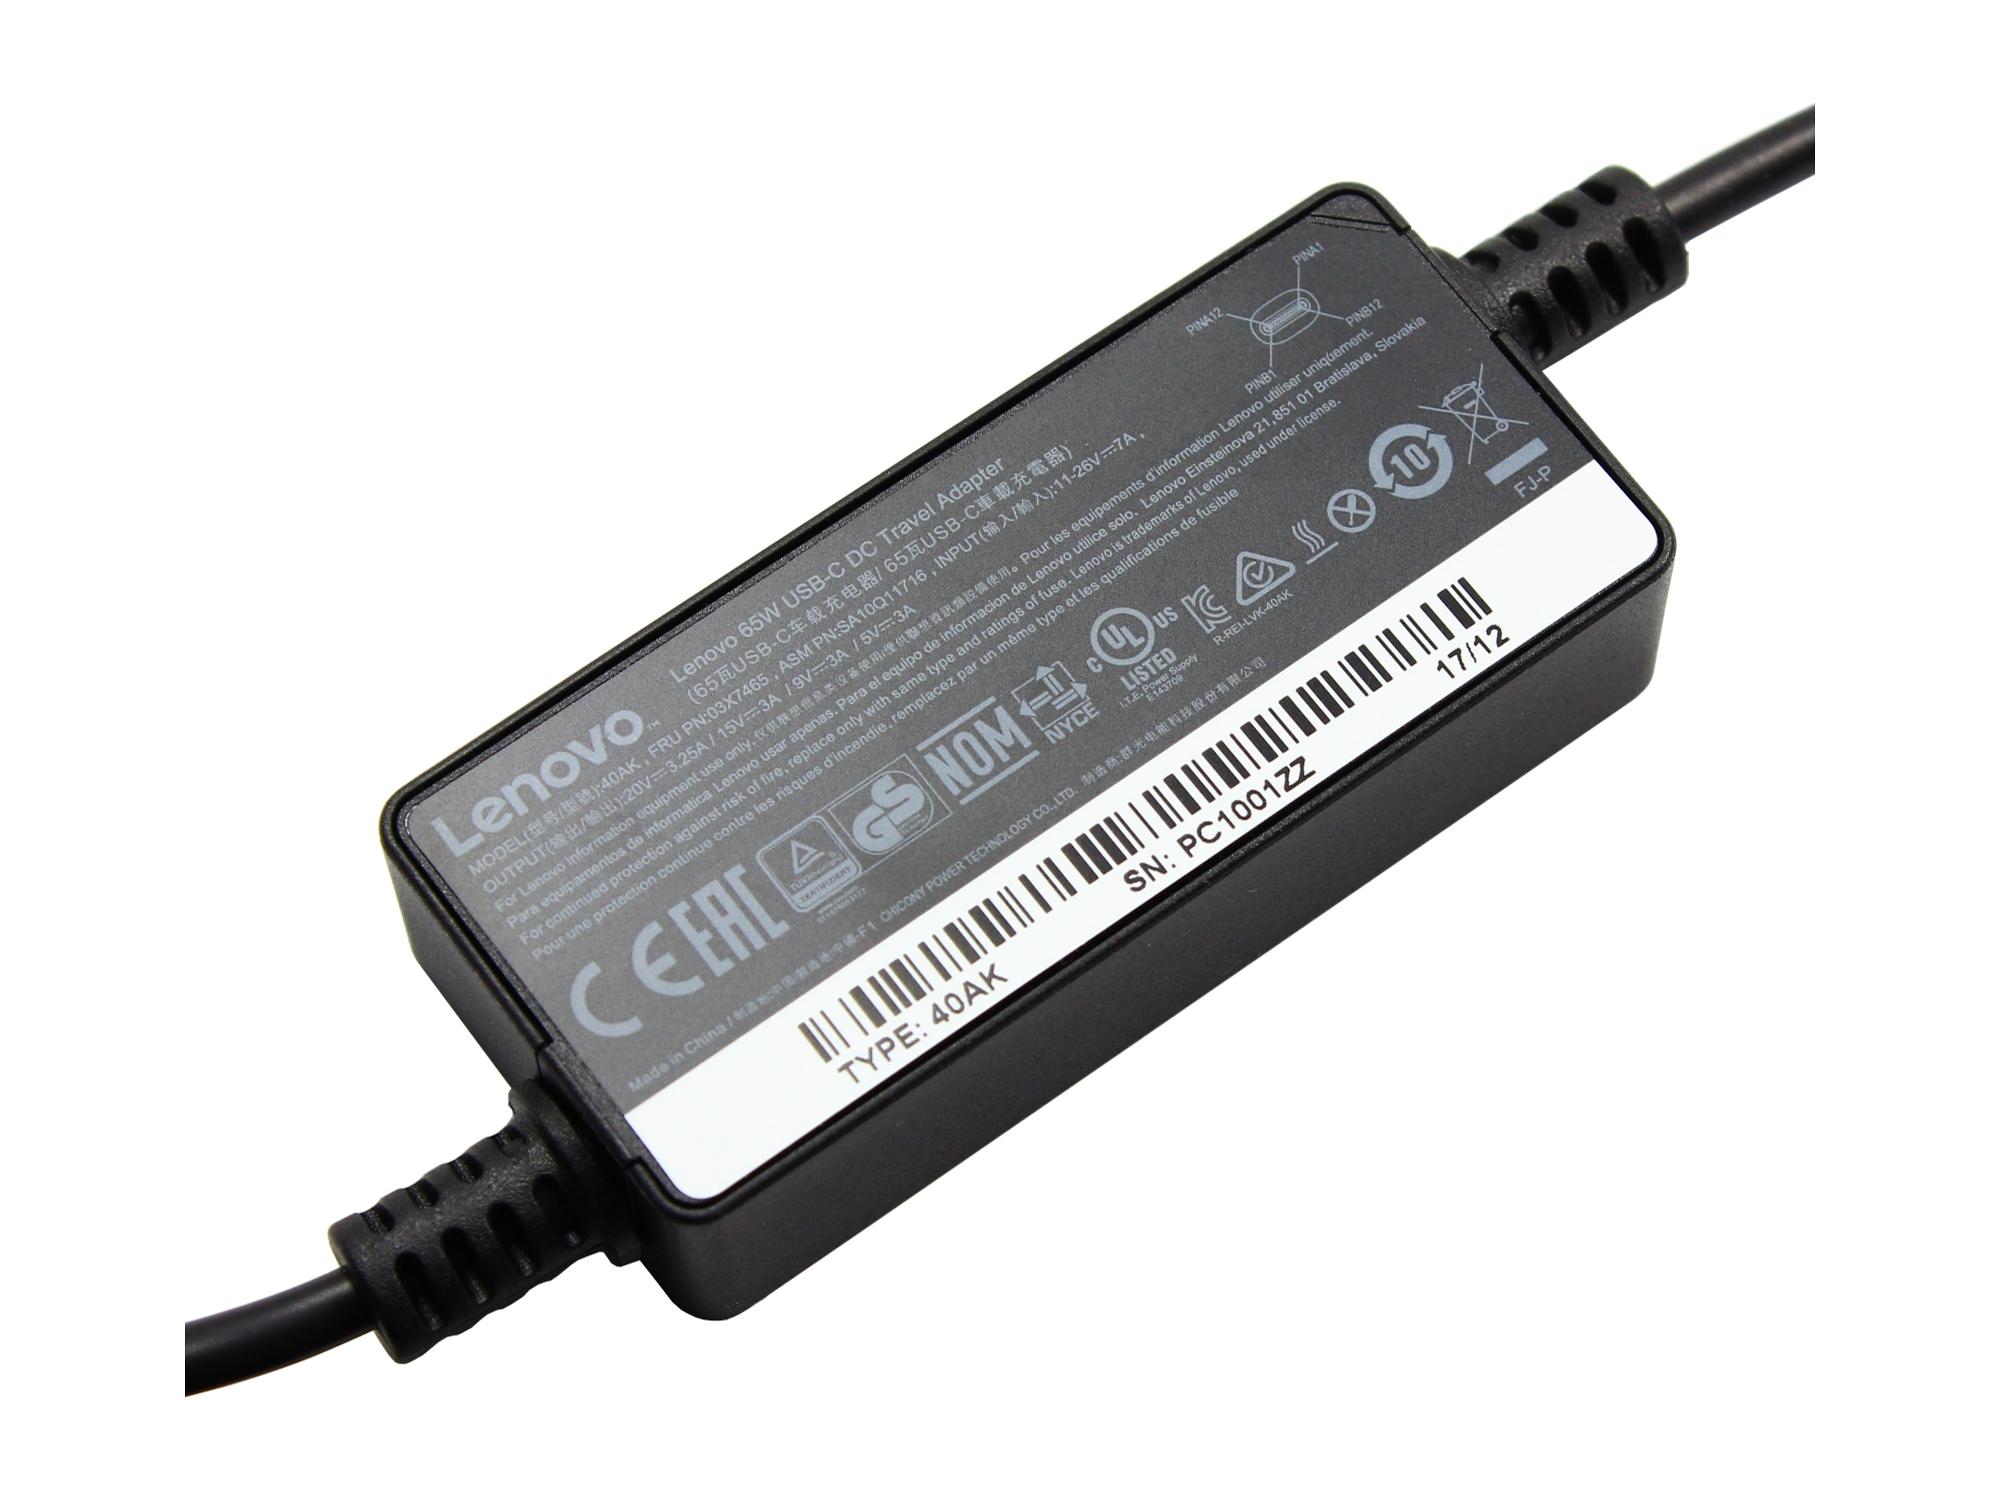 Incarcator auto original Lenovo 65W, USB-C